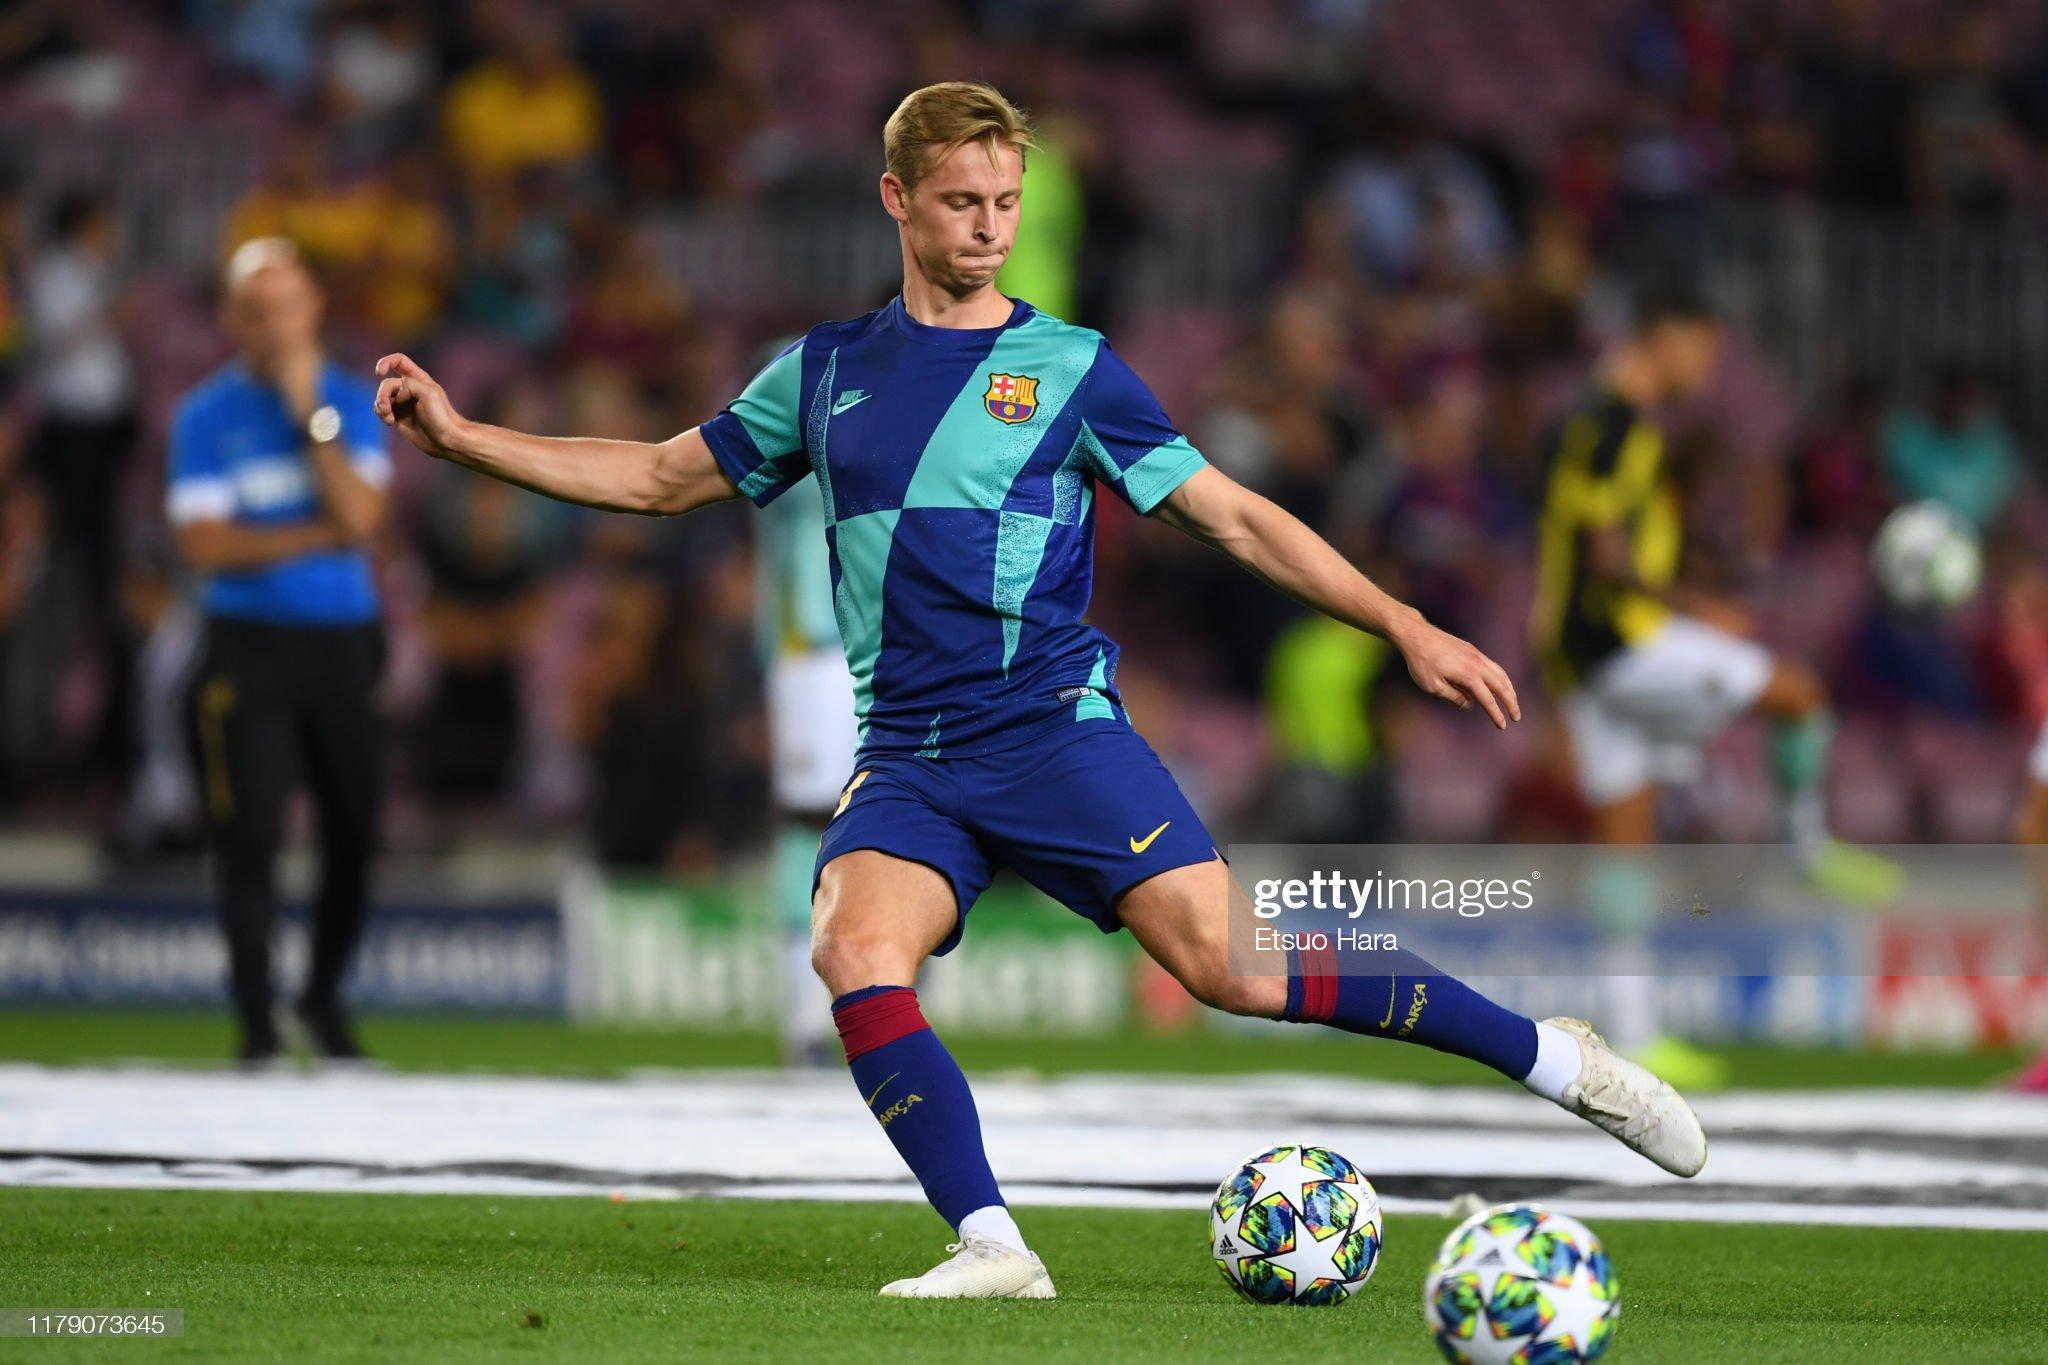 صور مباراة : برشلونة - إنتر 2-1 ( 02-10-2019 )  Frankie-de-jong-of-fc-barcelona-warms-up-prior-to-the-uefa-champions-picture-id1179073645?s=2048x2048